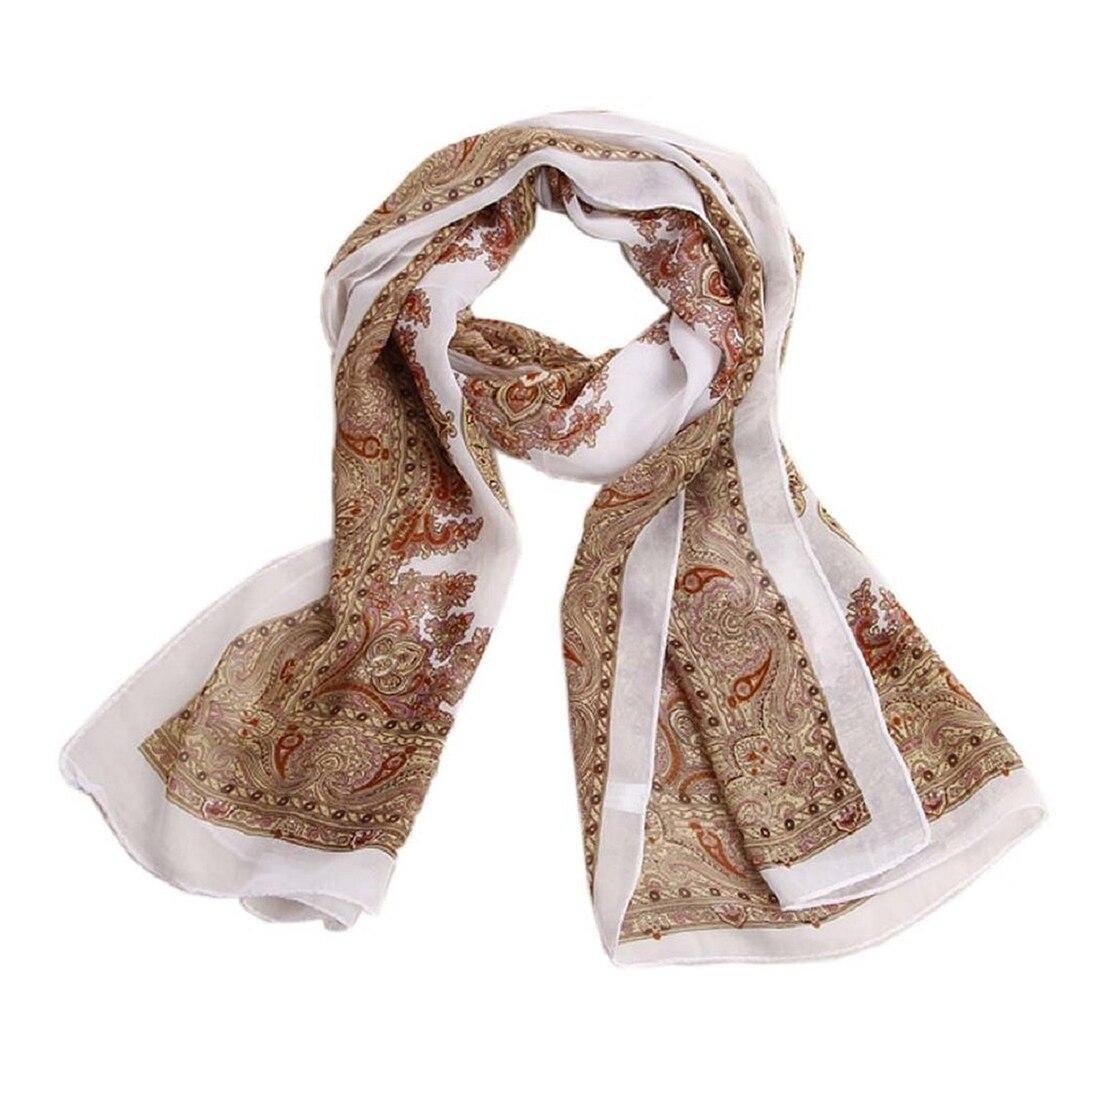 Women's Fashion Sweet Chiffon Long   Scarf     Wrap   stole Shawl   Scarves   Beige